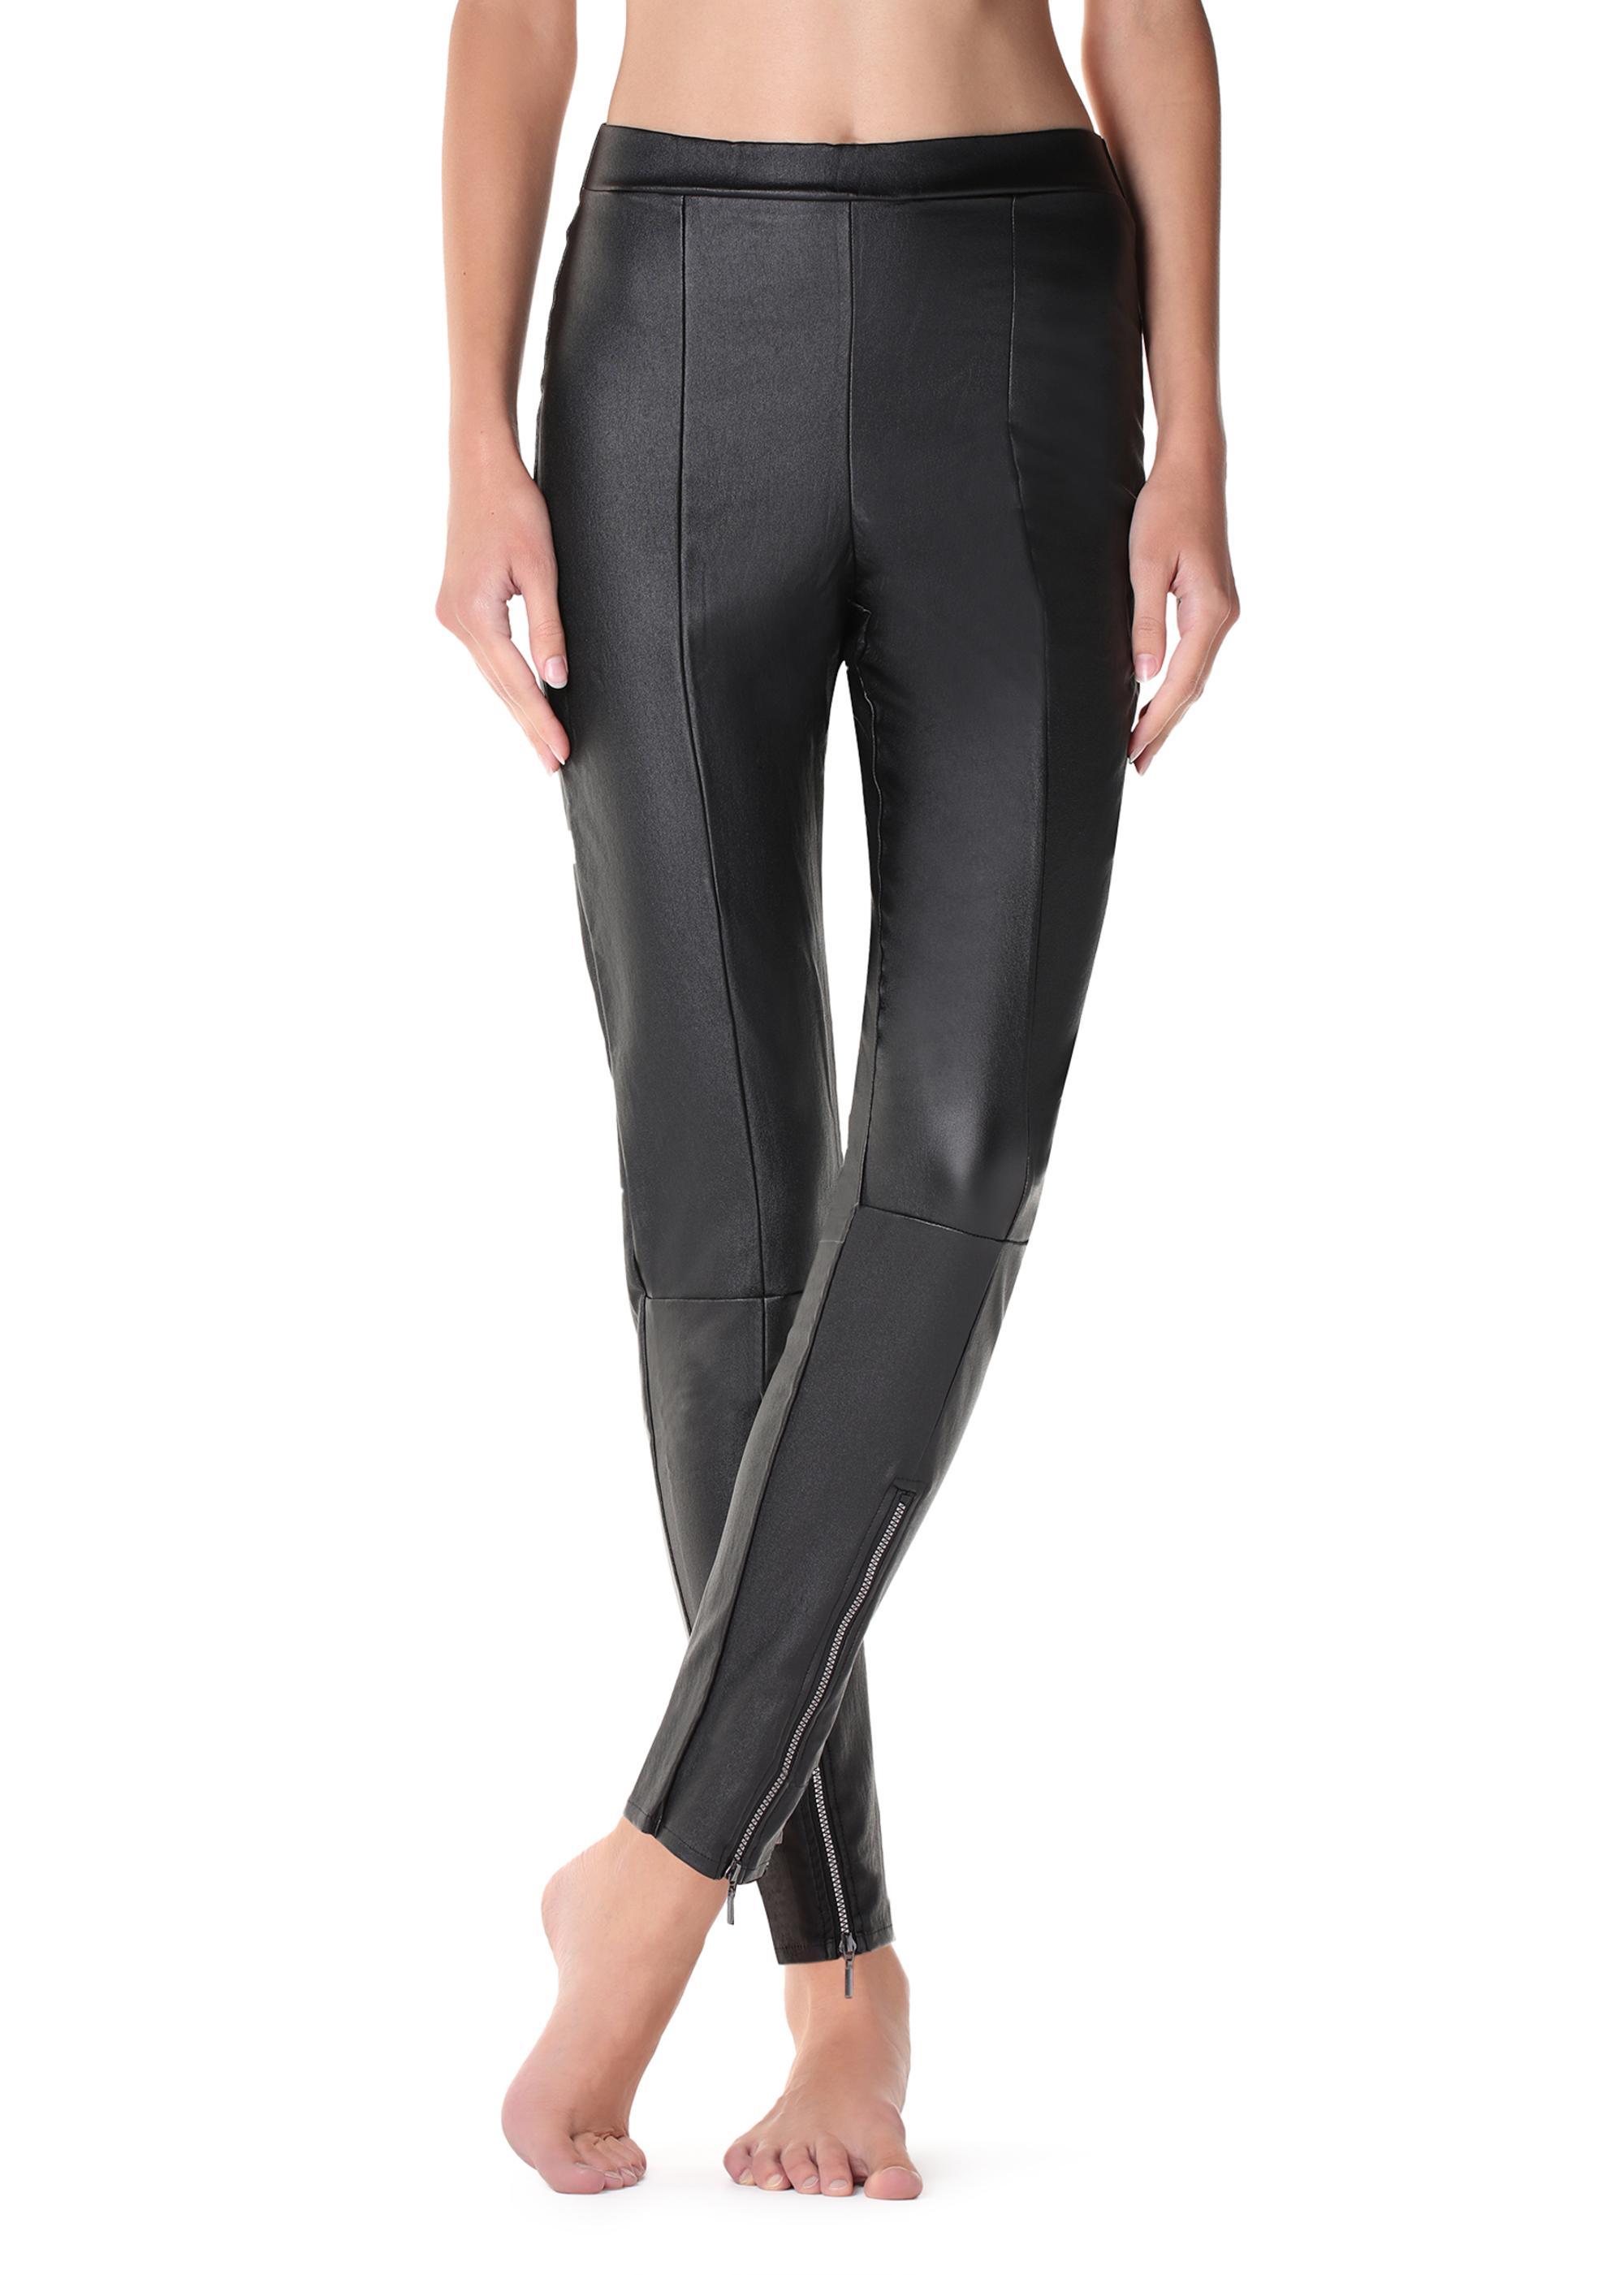 569c0a3094c618 Leather-effect leggings - Calzedonia